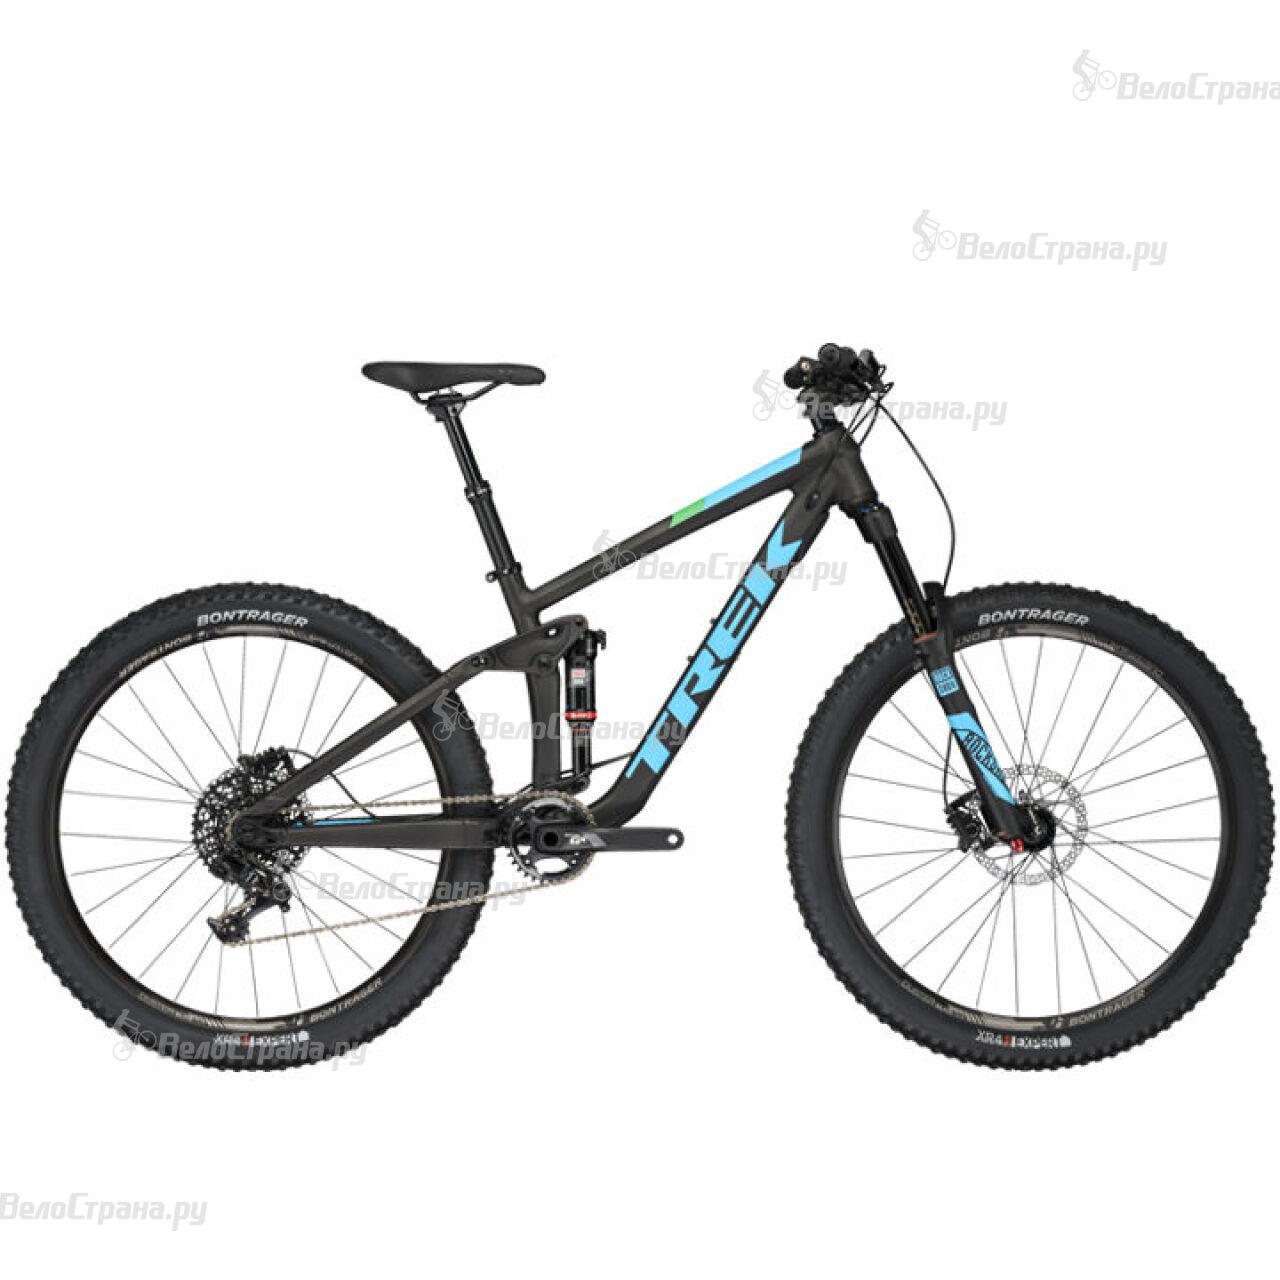 Велосипед Trek Remedy 8 27.5 WSD (2017) велосипед trek shift 3 wsd 2013